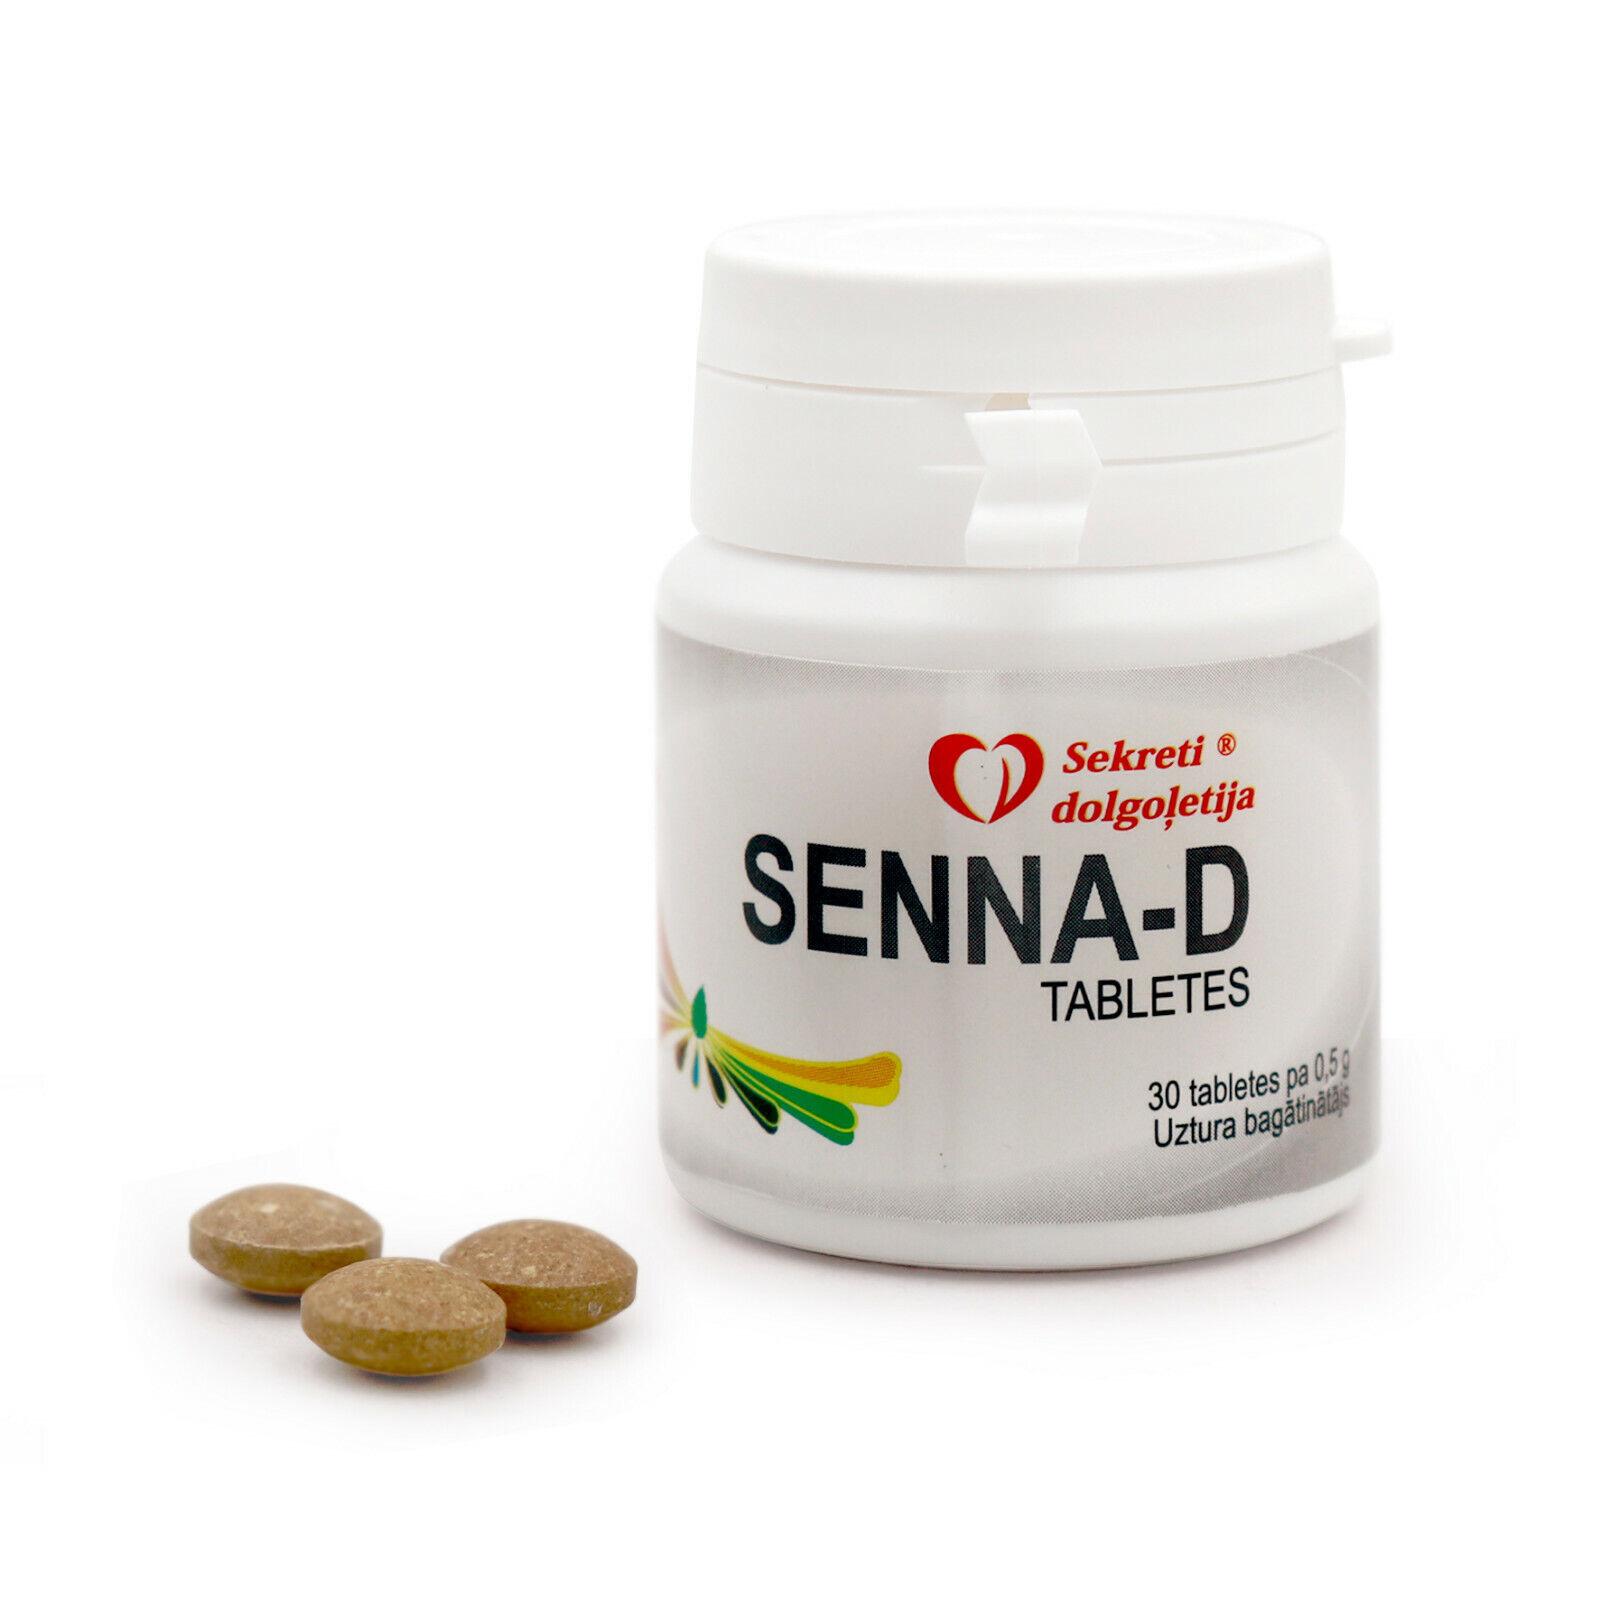 Senna D 30Tabl. Abführmittel Senne Darm Verdauung сенна слабительное пищеварение